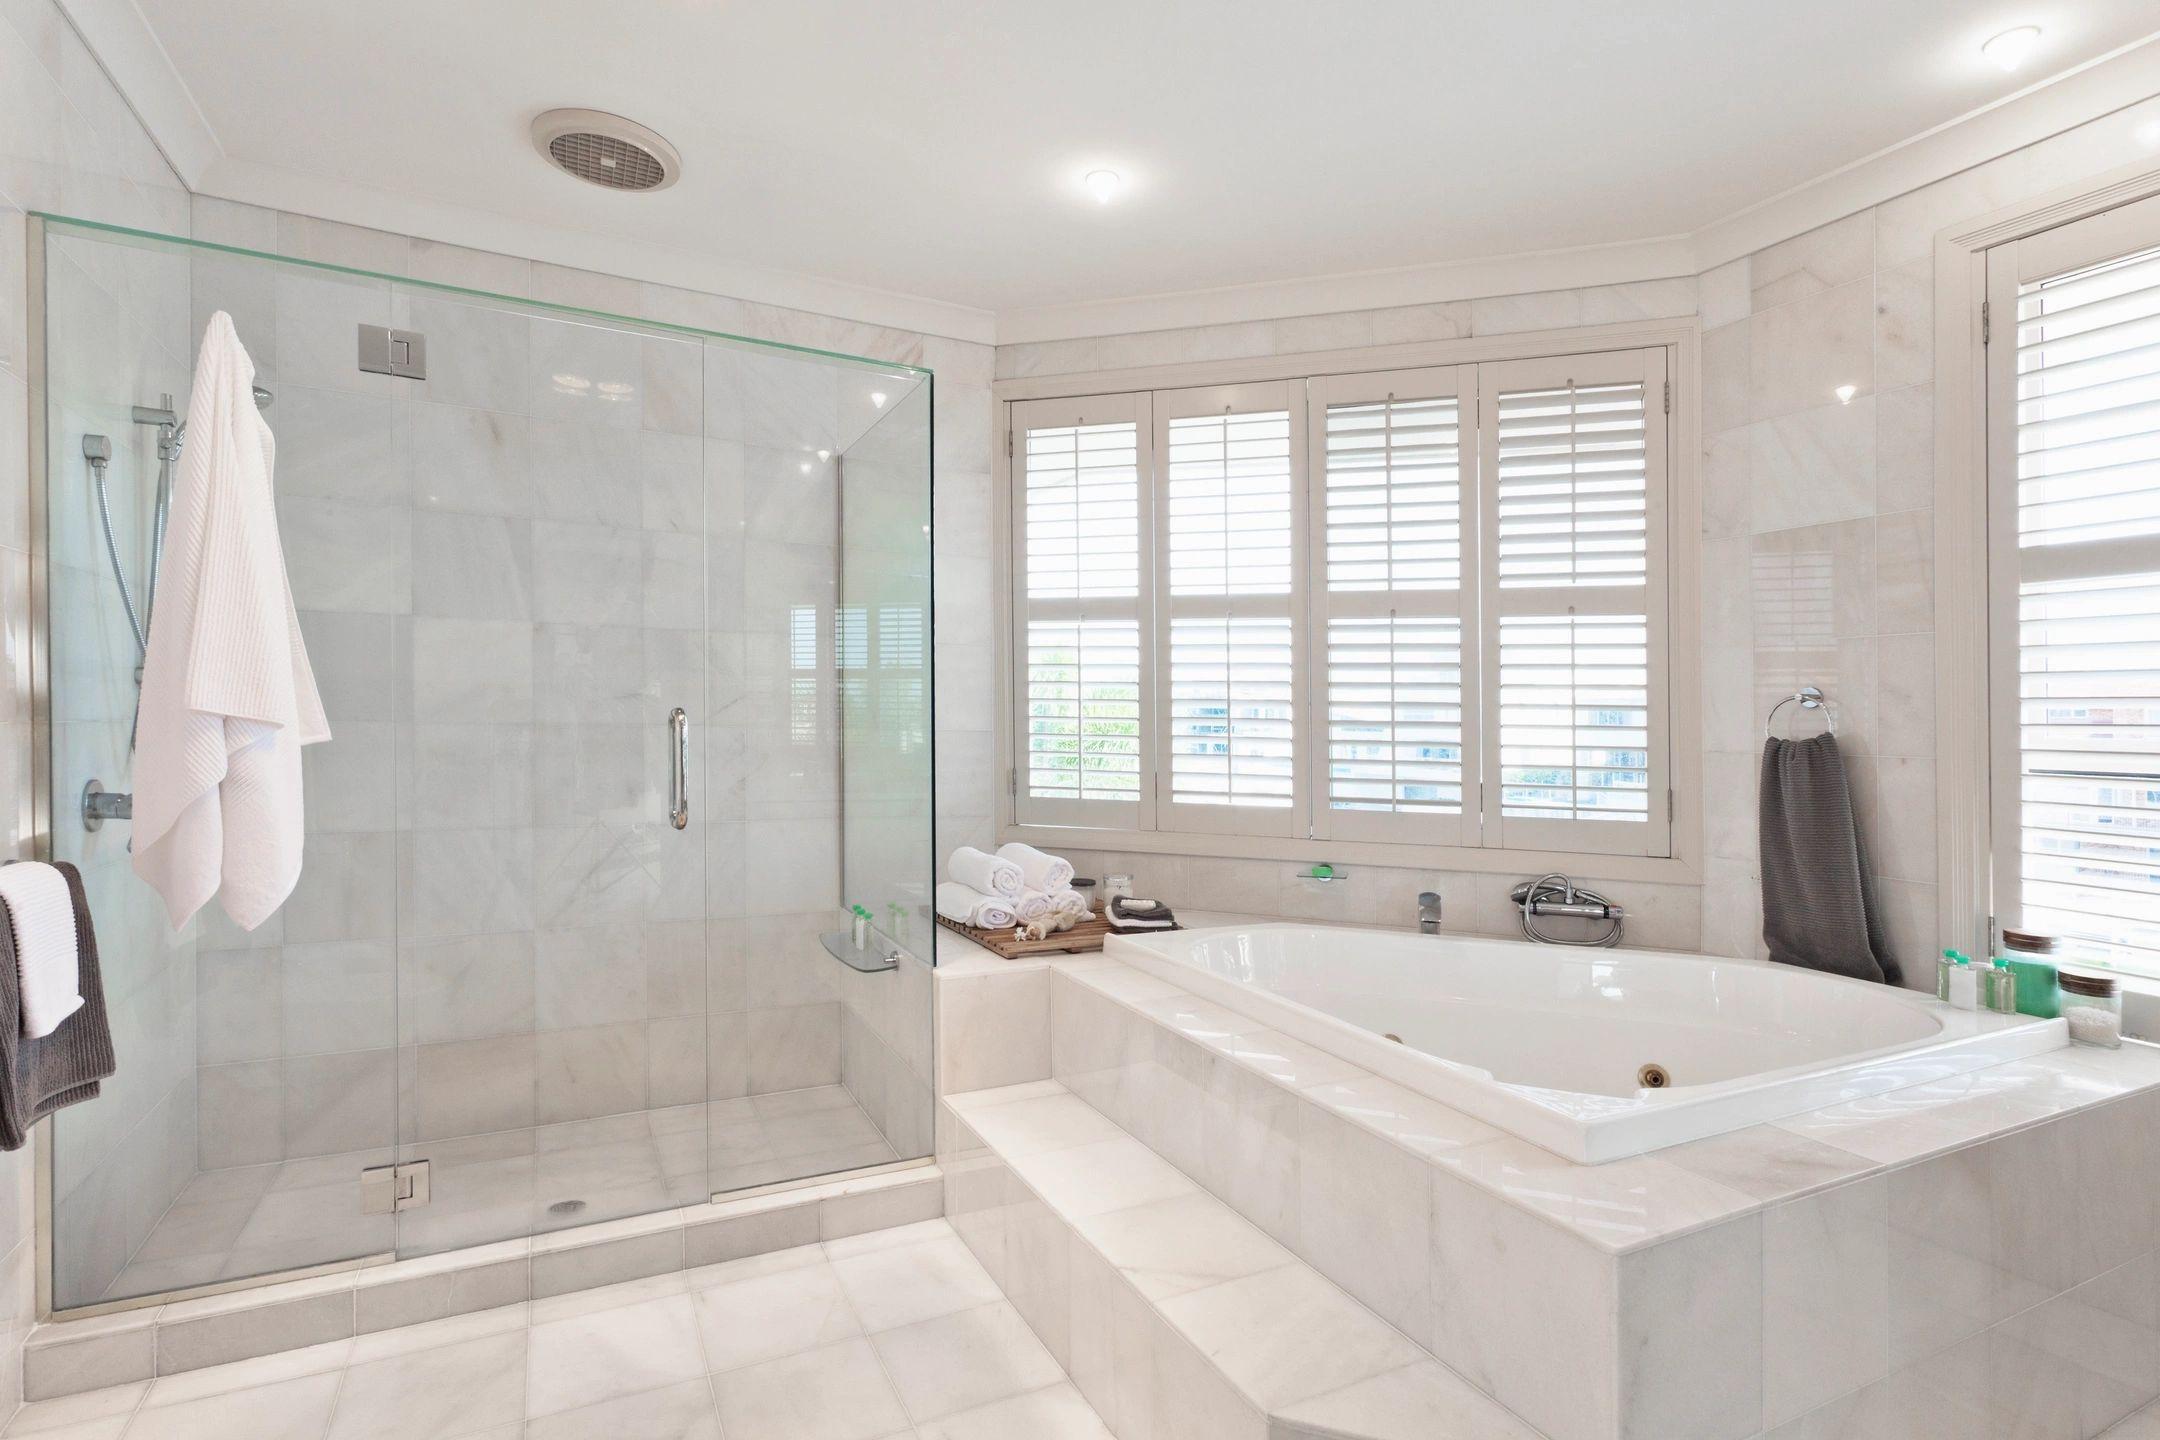 Top Drawer Construction white and silver bathroom installation service Woking Weybridge Surrey